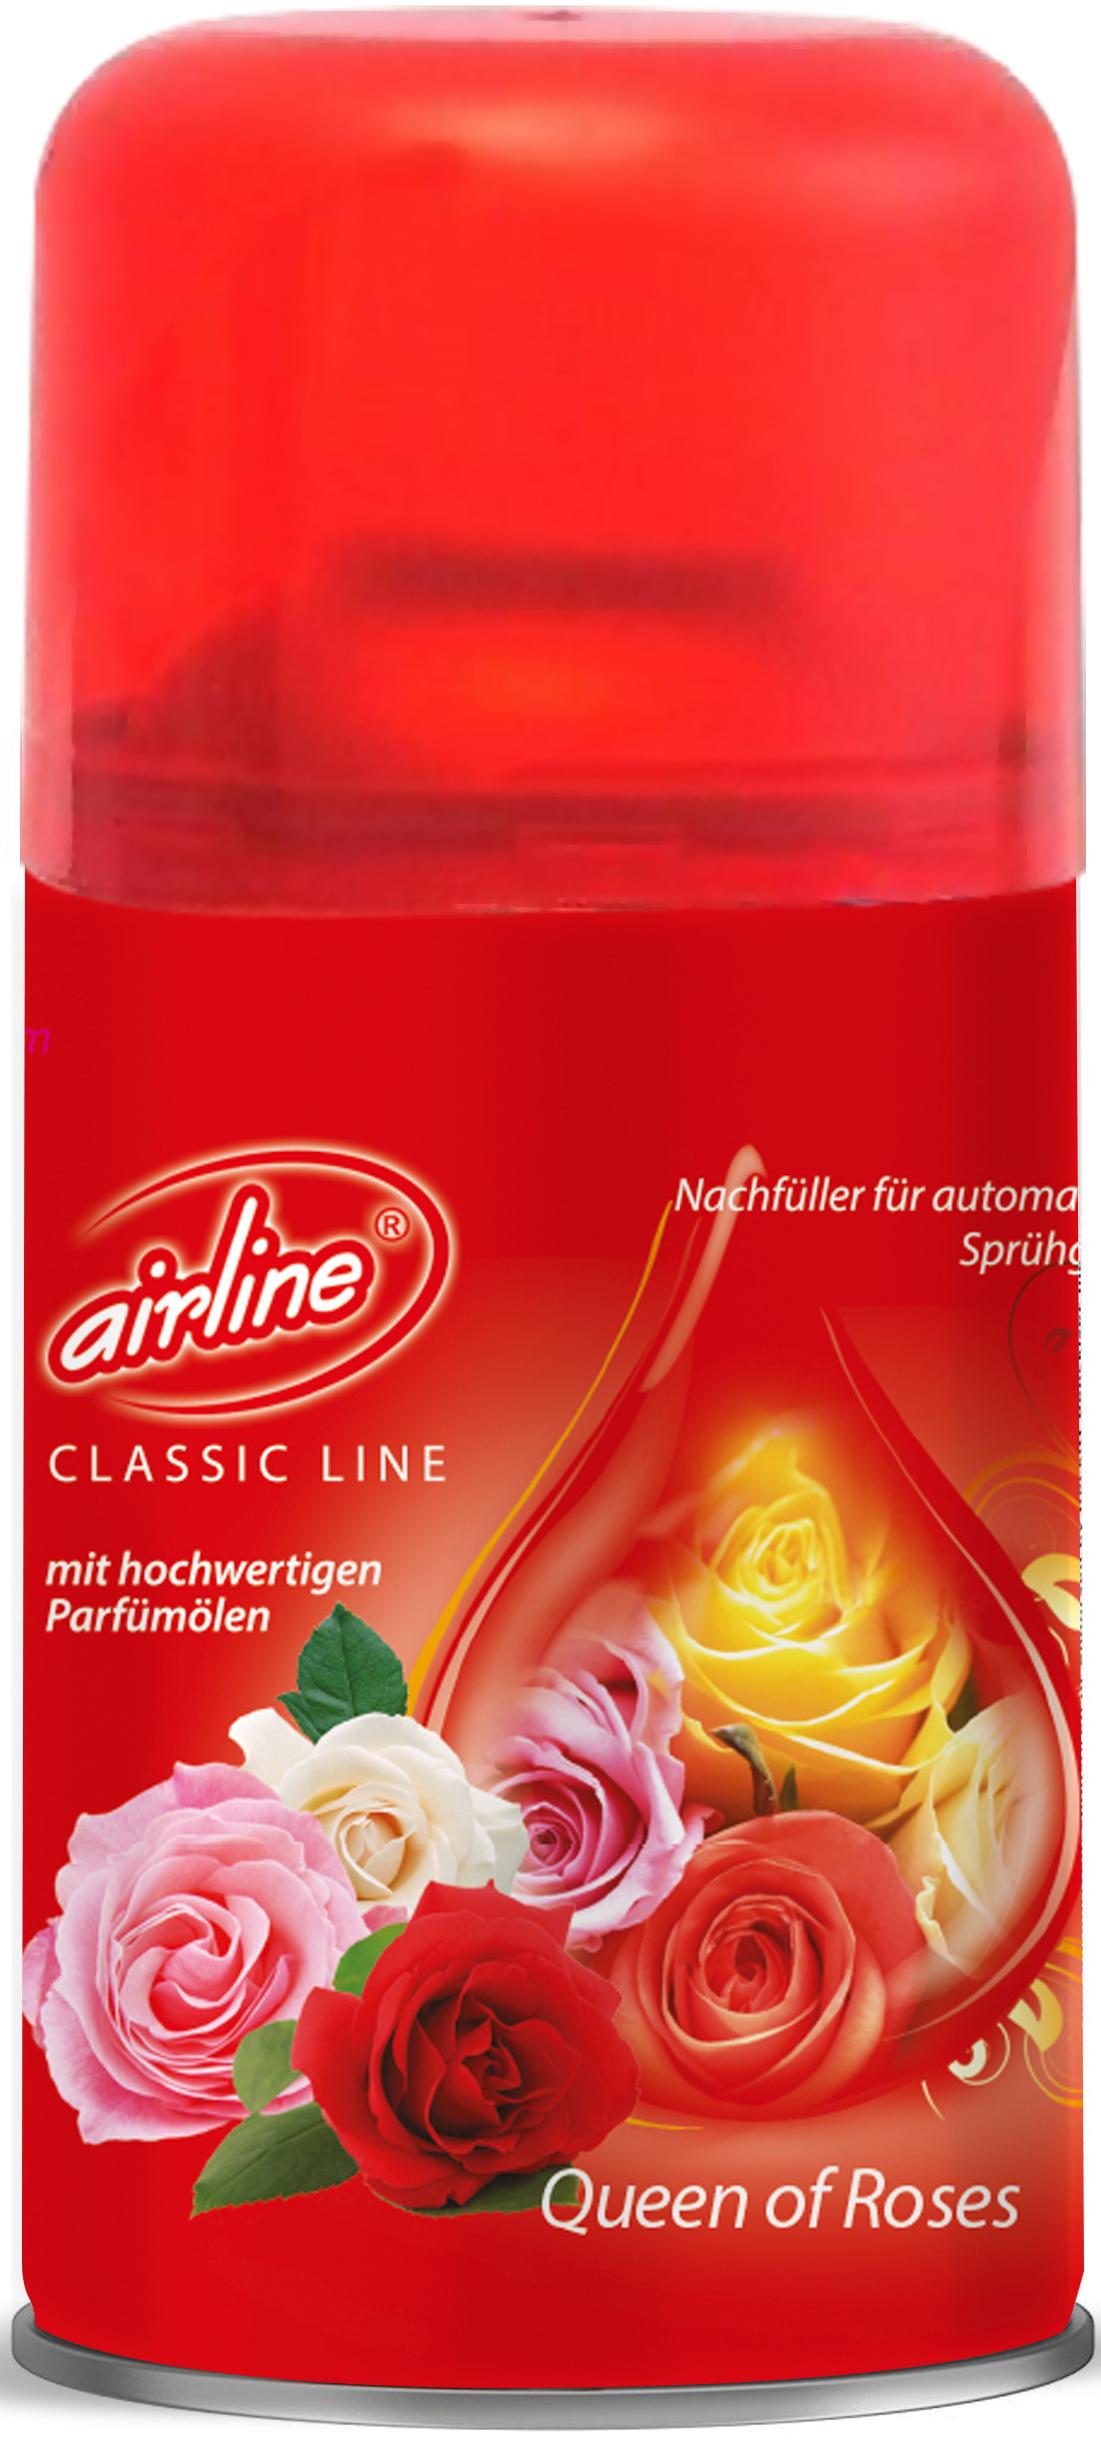 00509 - airline Classic Line Queen of Roses Nachfüllkartusche 250 ml